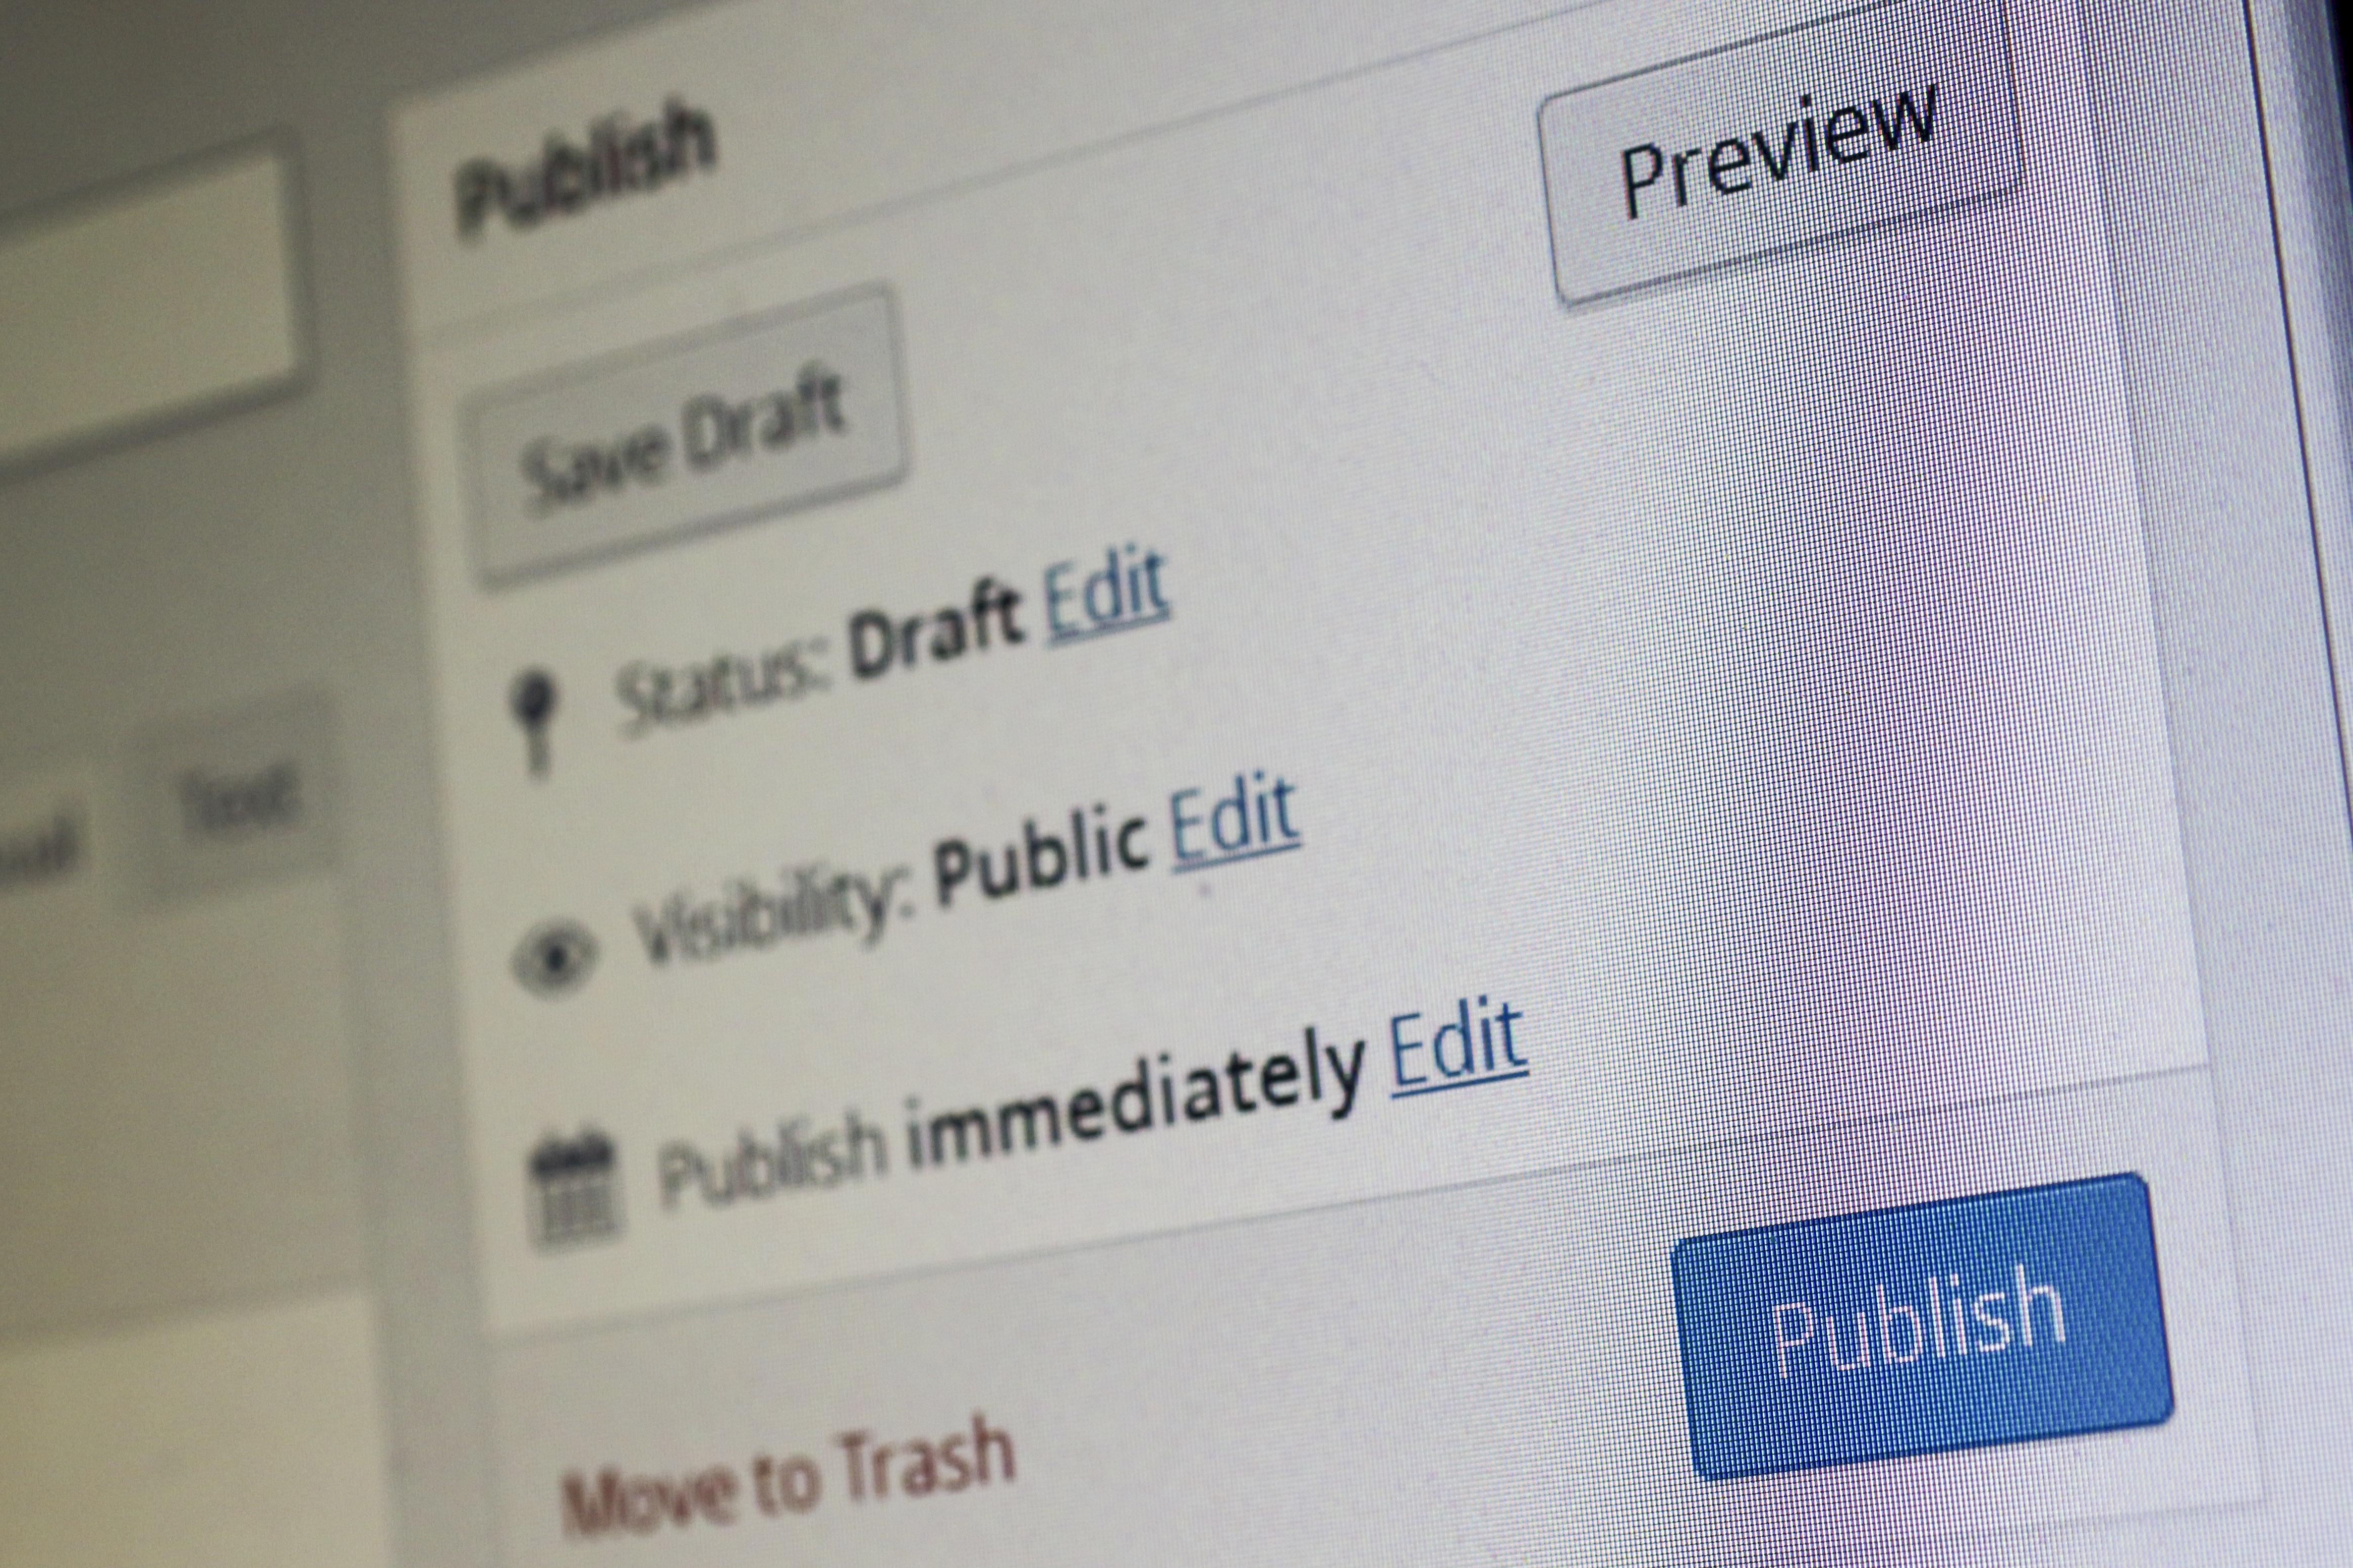 screen post web internet create brand product text media wordpress document leave blog content publish upload